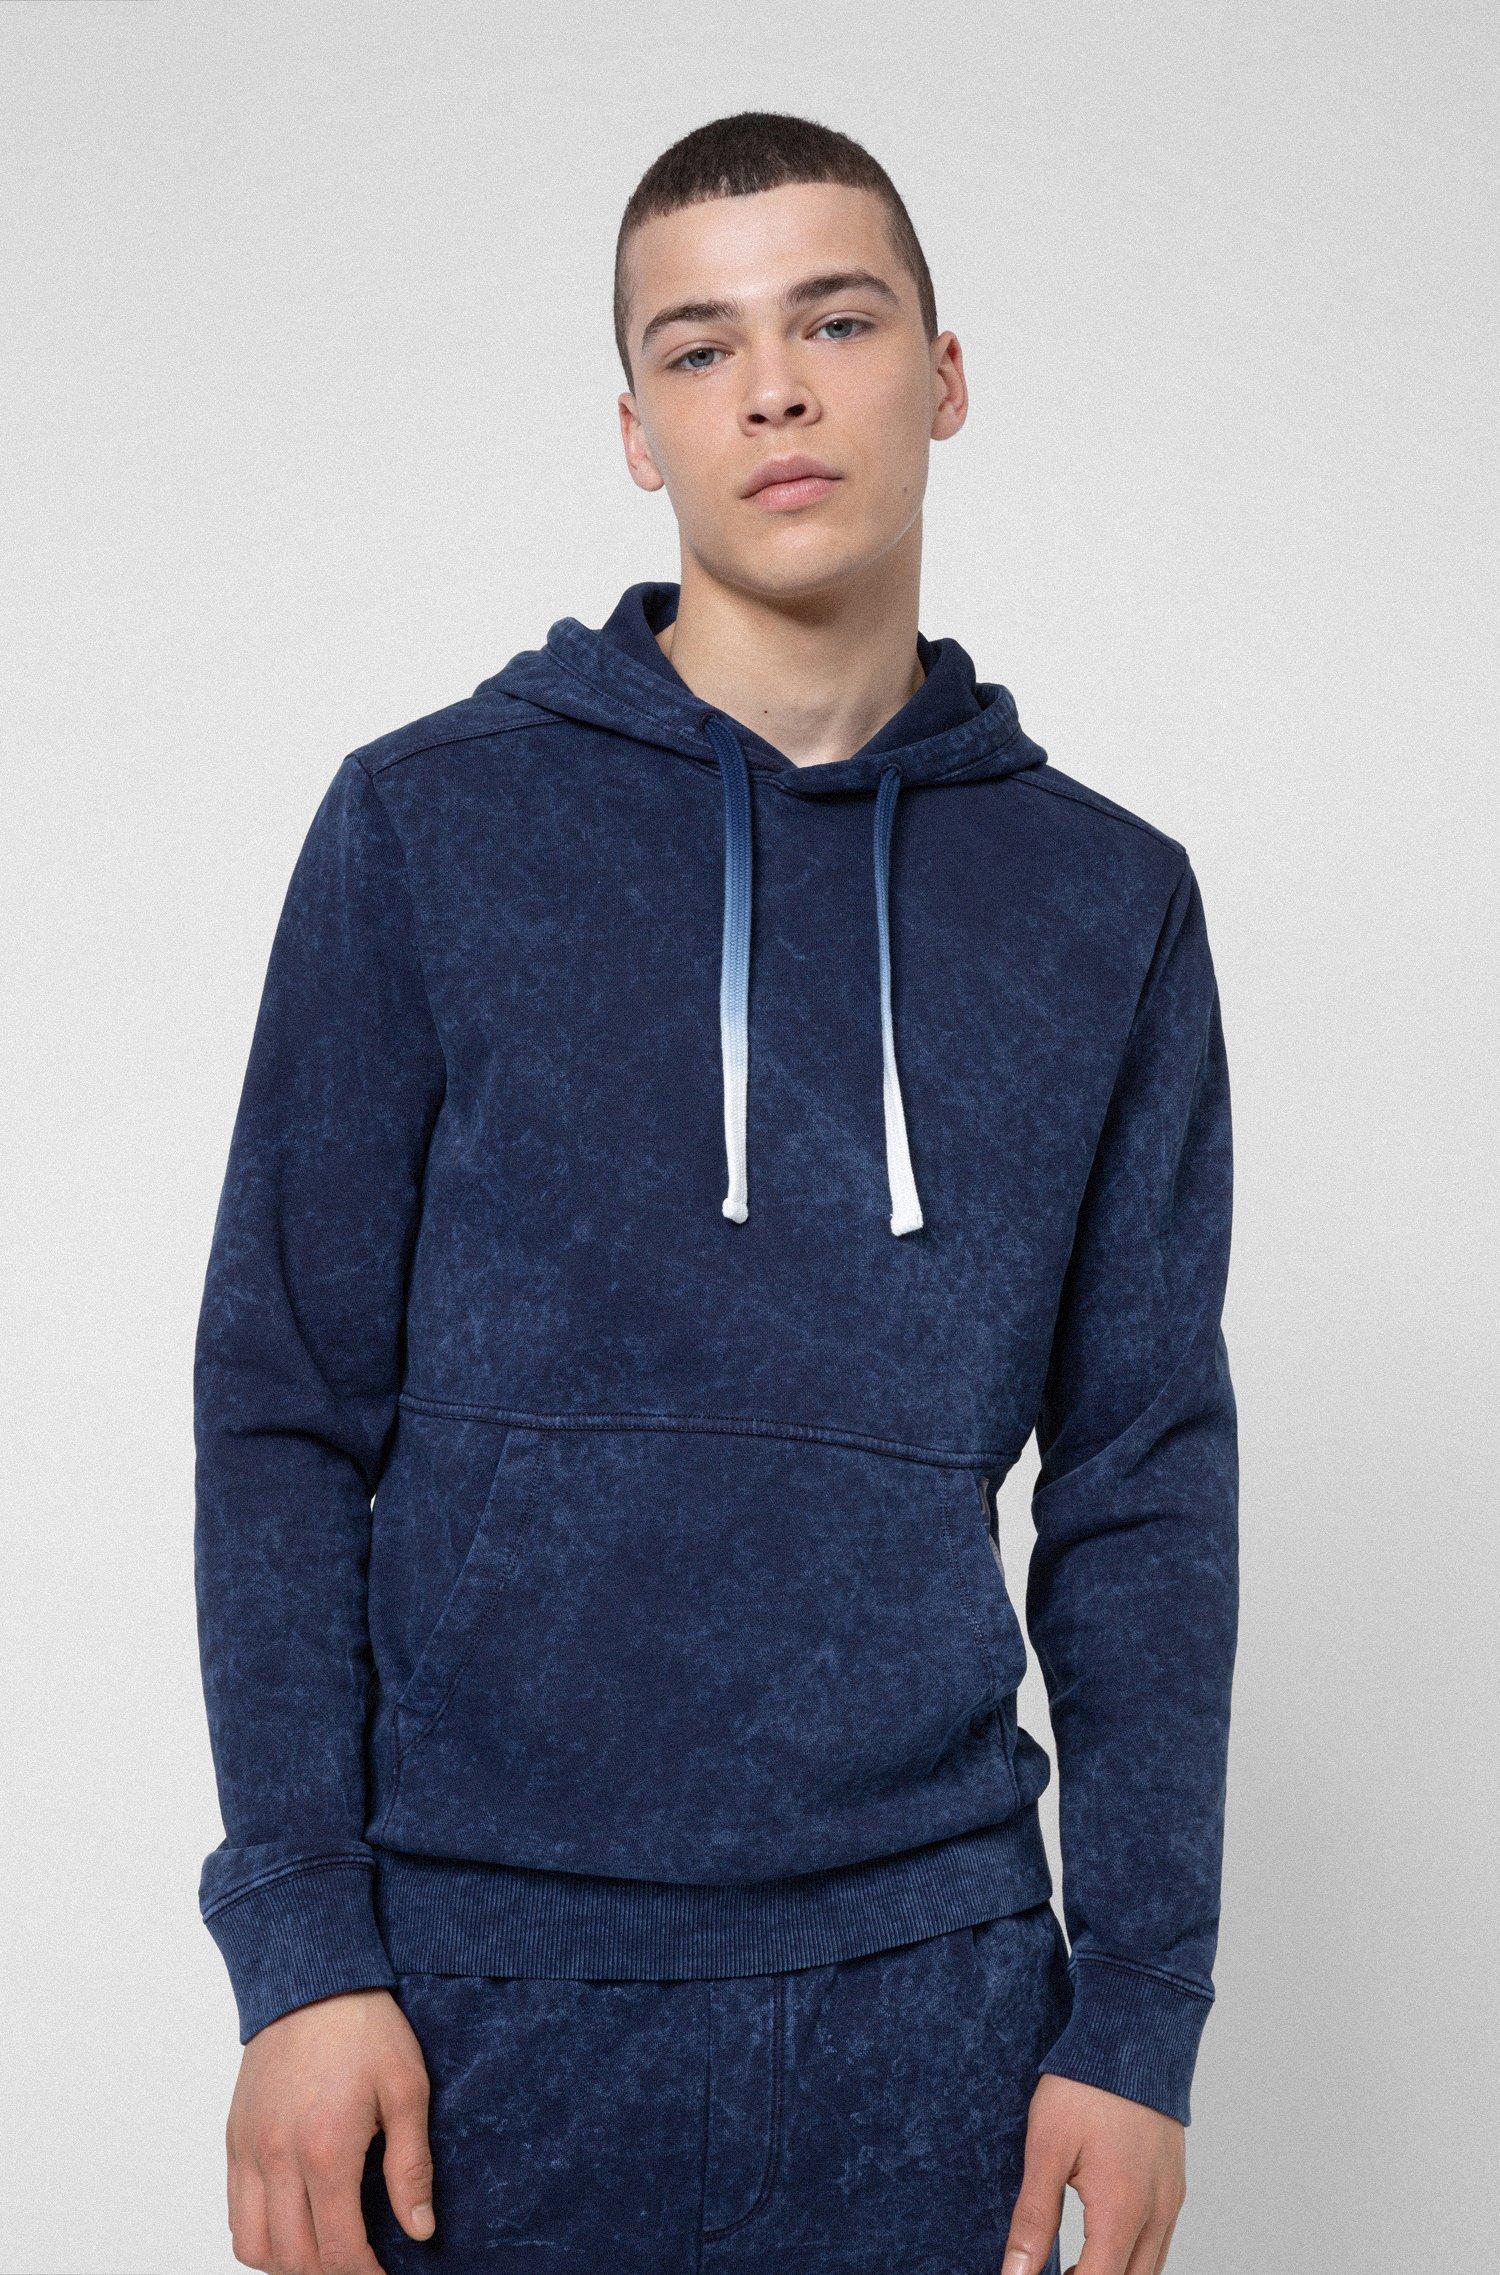 Hooded sweatshirt in Recot2® cotton with manifesto logo, Dark Blue